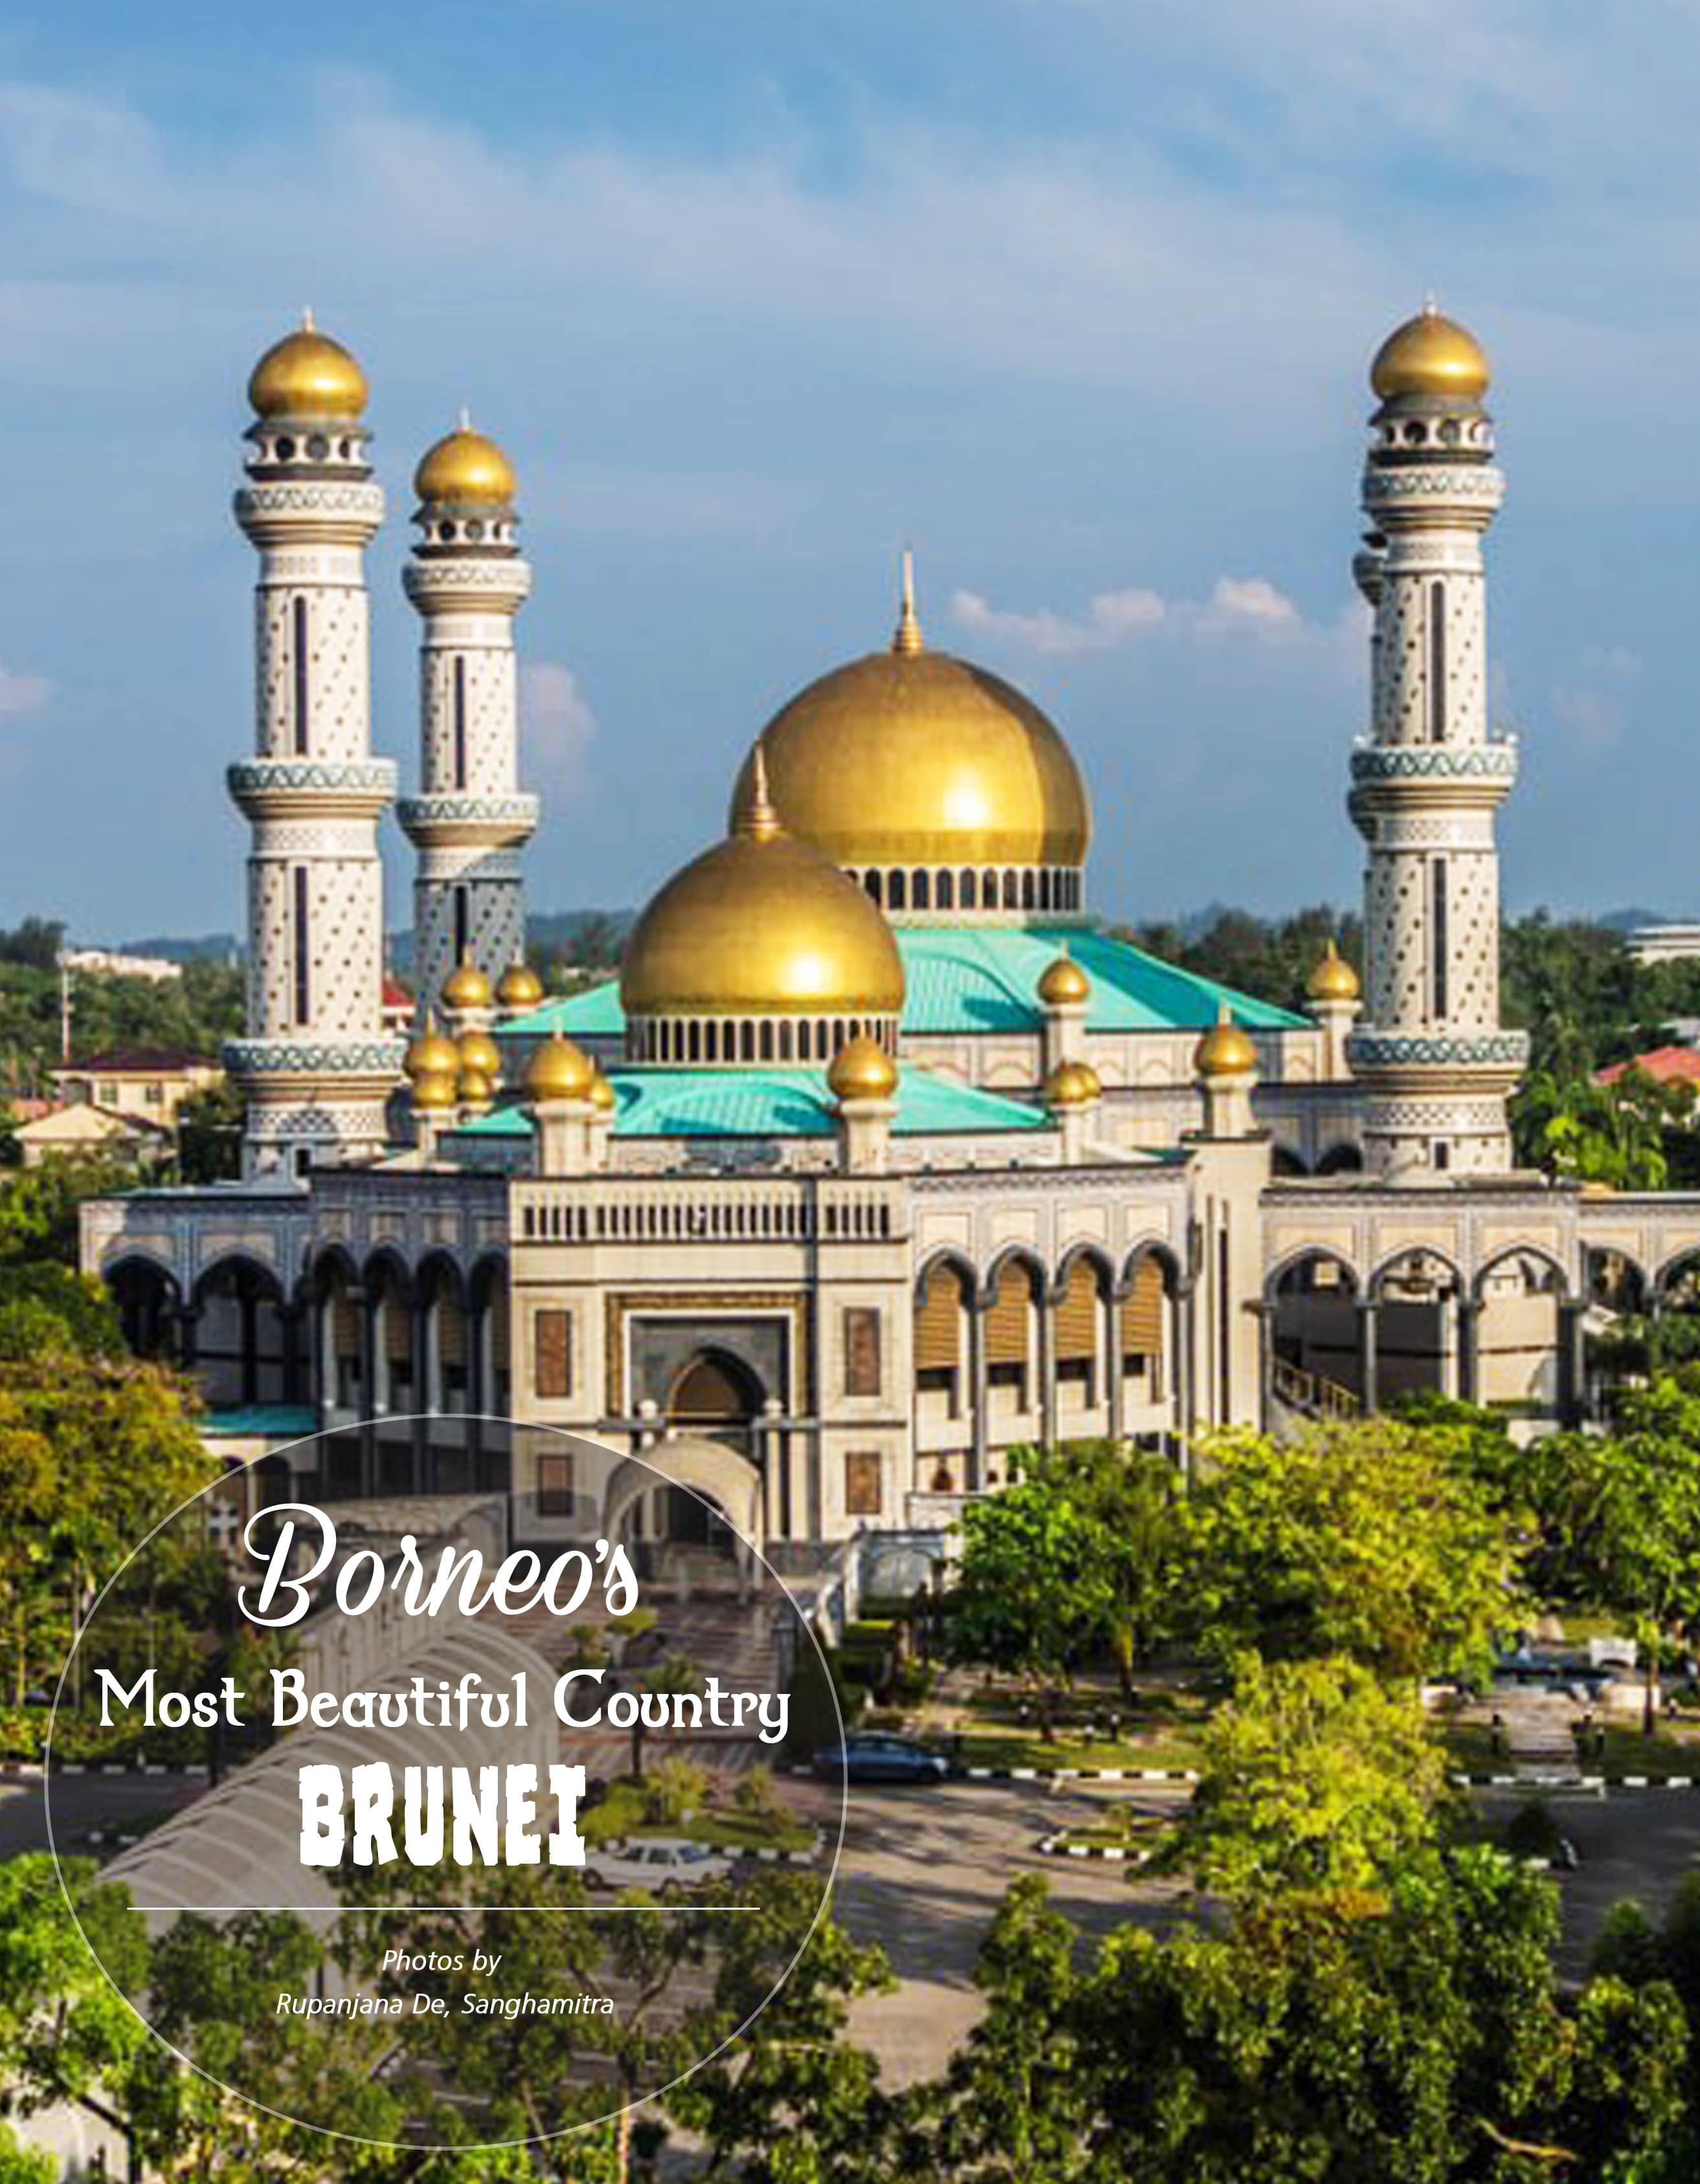 Borneo's Most Beautiful Country BRUNEI